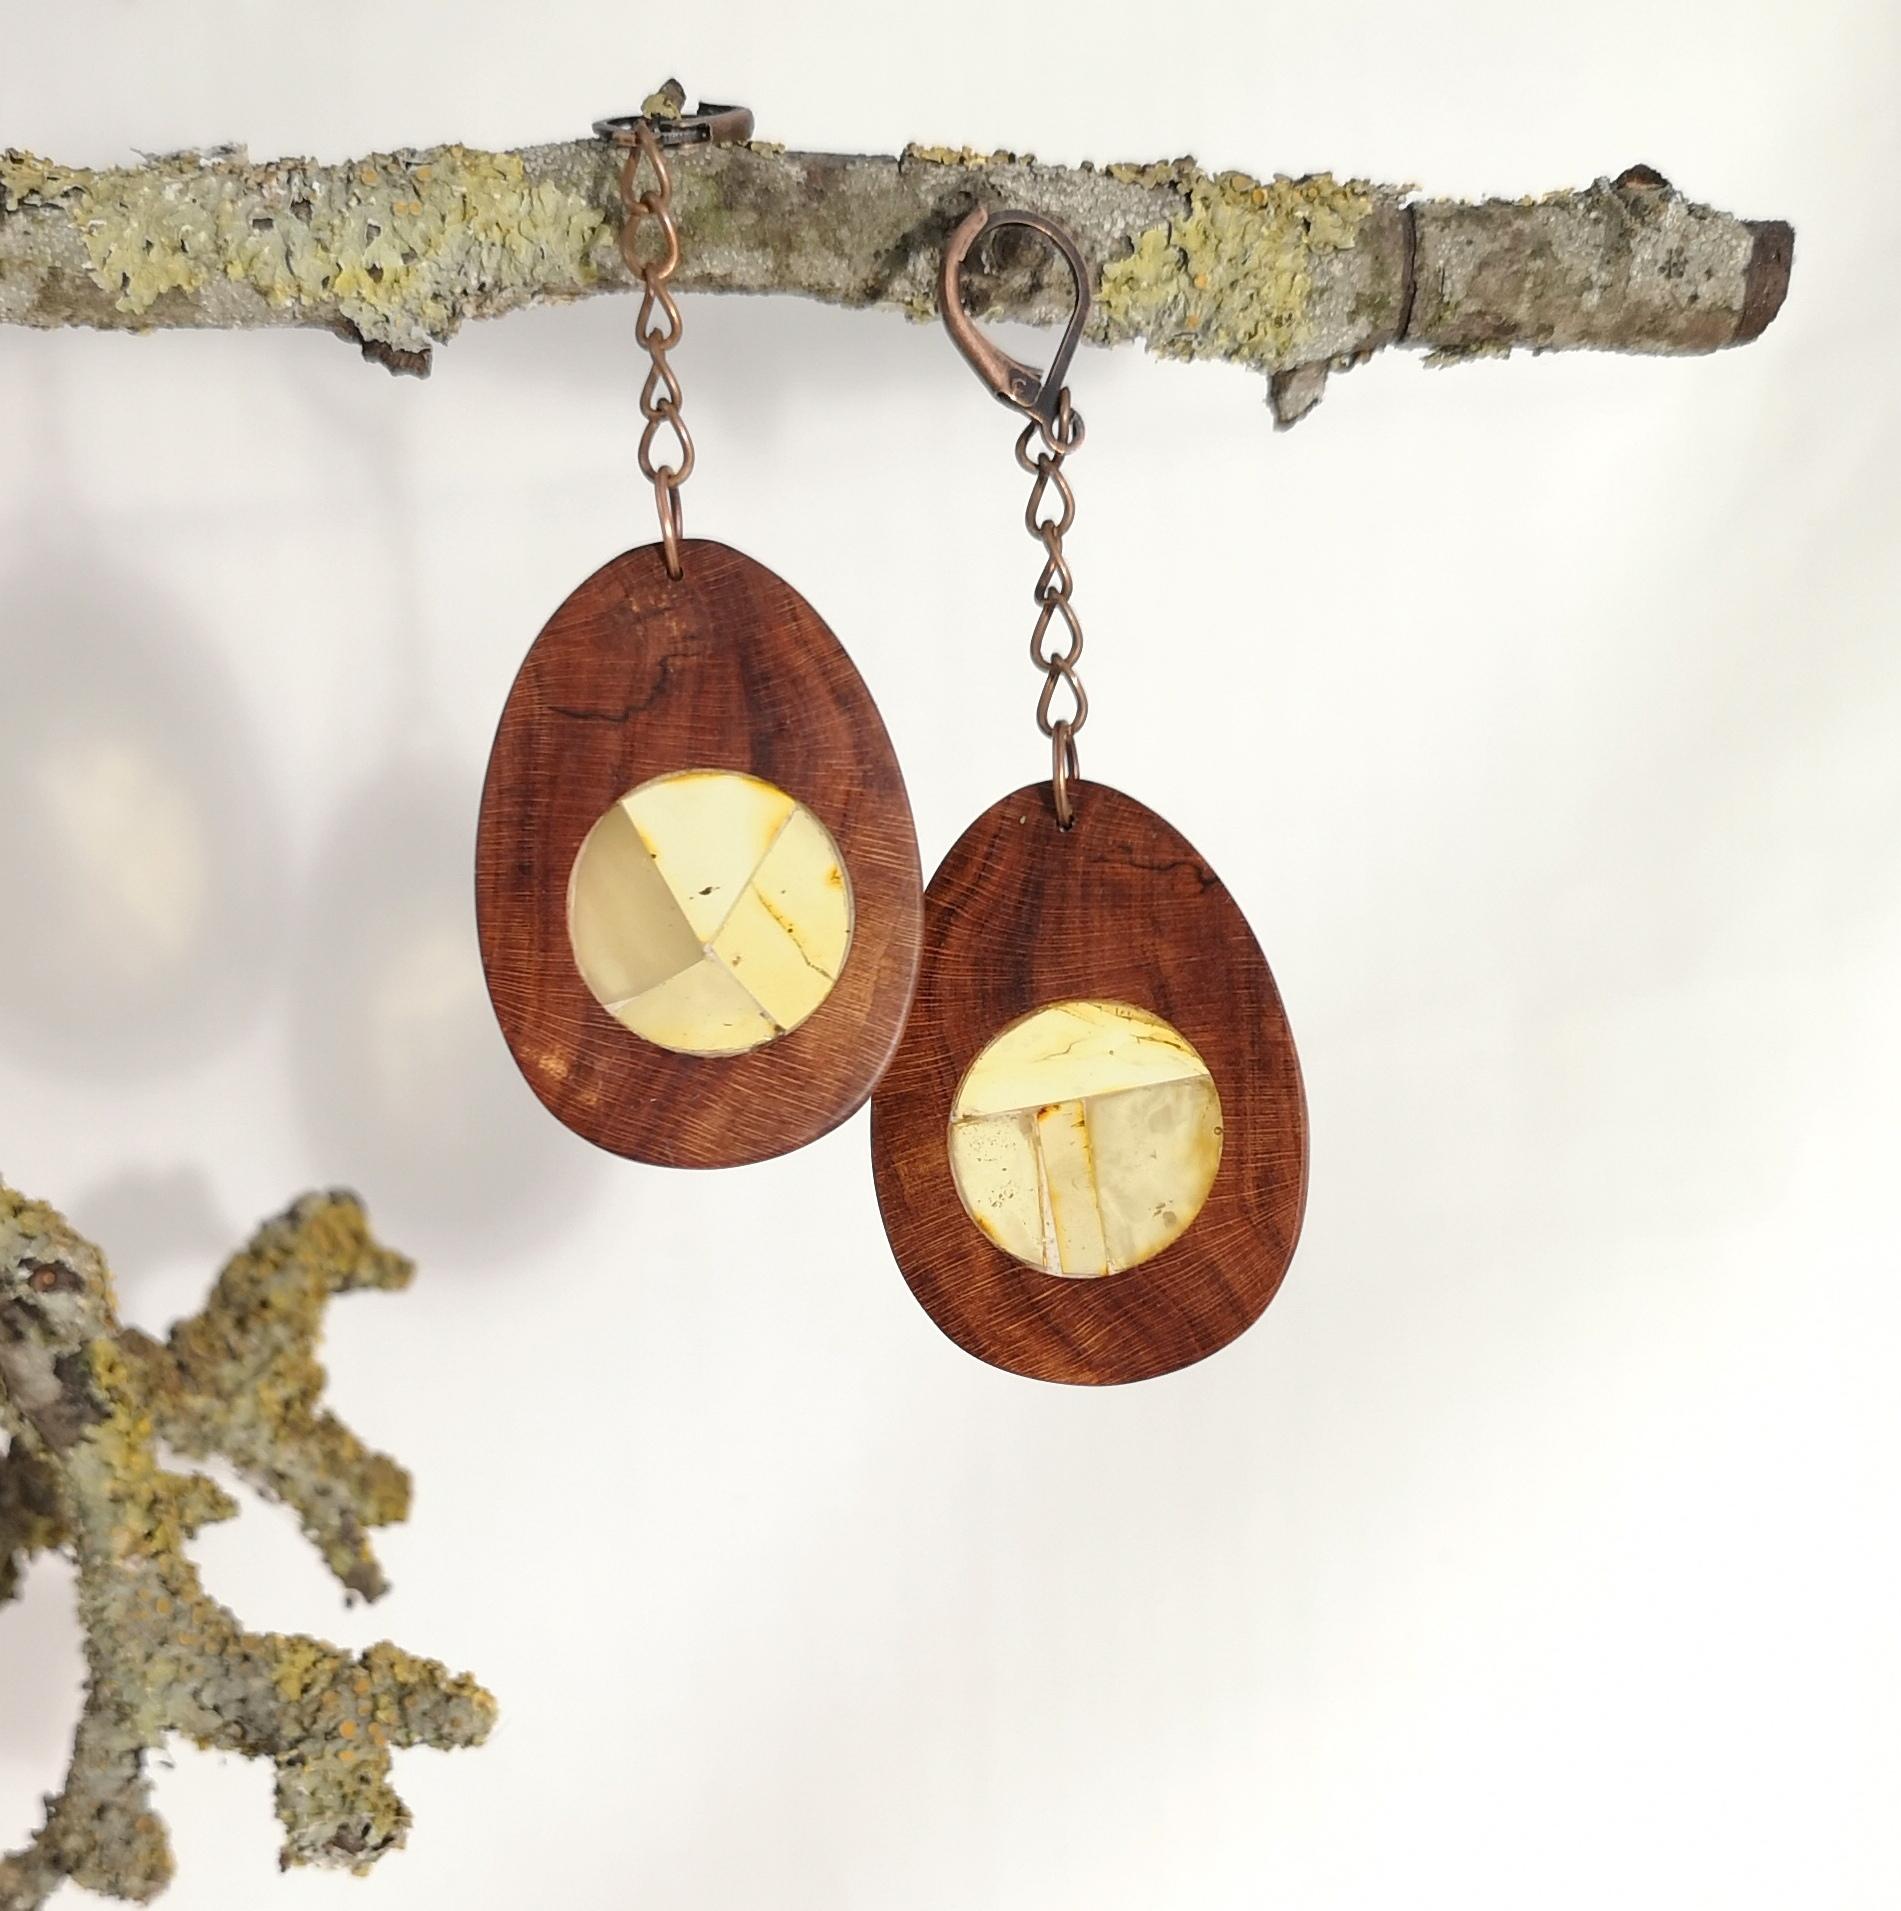 M0701 earrings